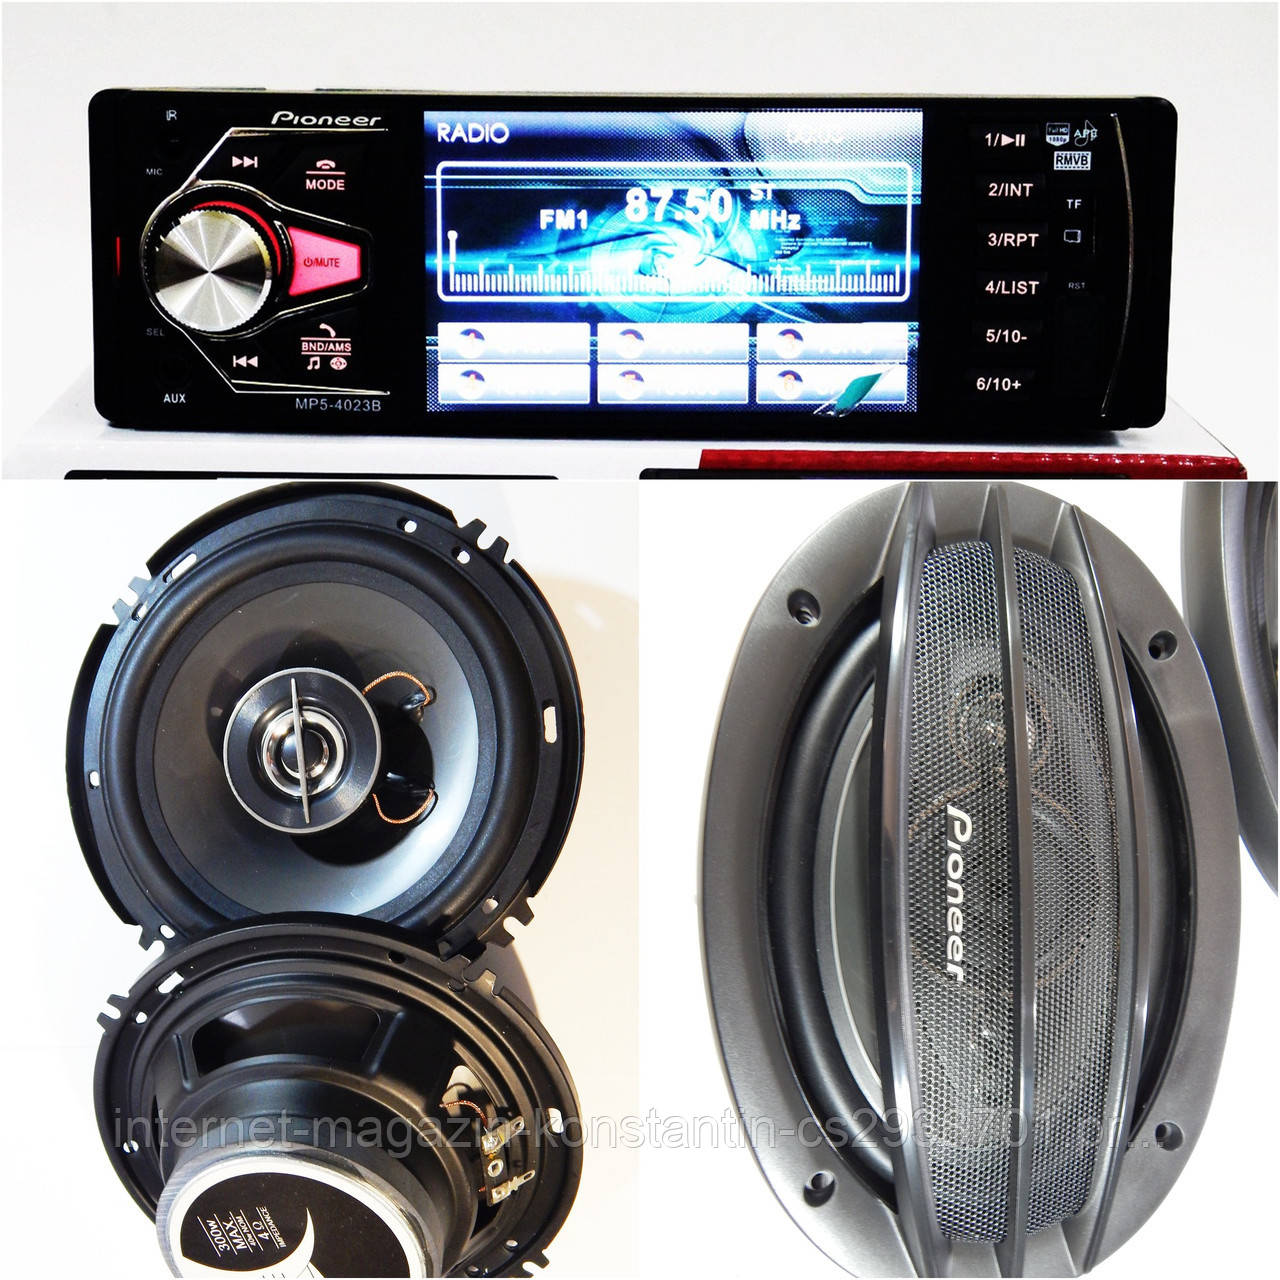 Набор Авто-звука с МР4 ВИДЕО Магнитолой Pioneer 4023B + Овалы 1000W + круглые 16 см 300W! НОВИНКА